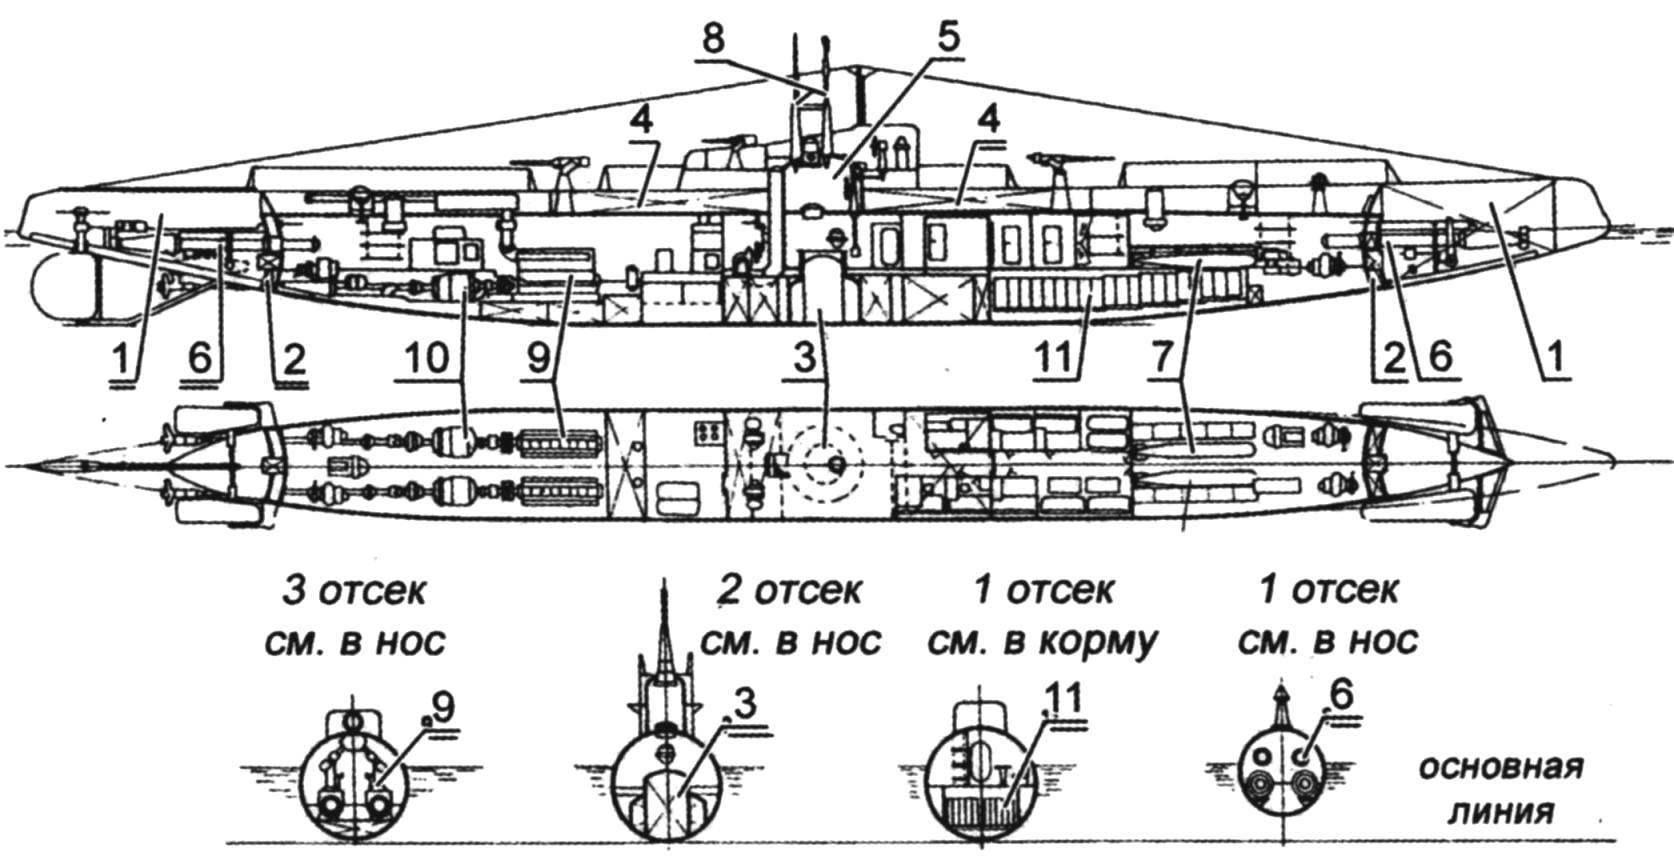 General scheme of the modernized submarine B-2 (